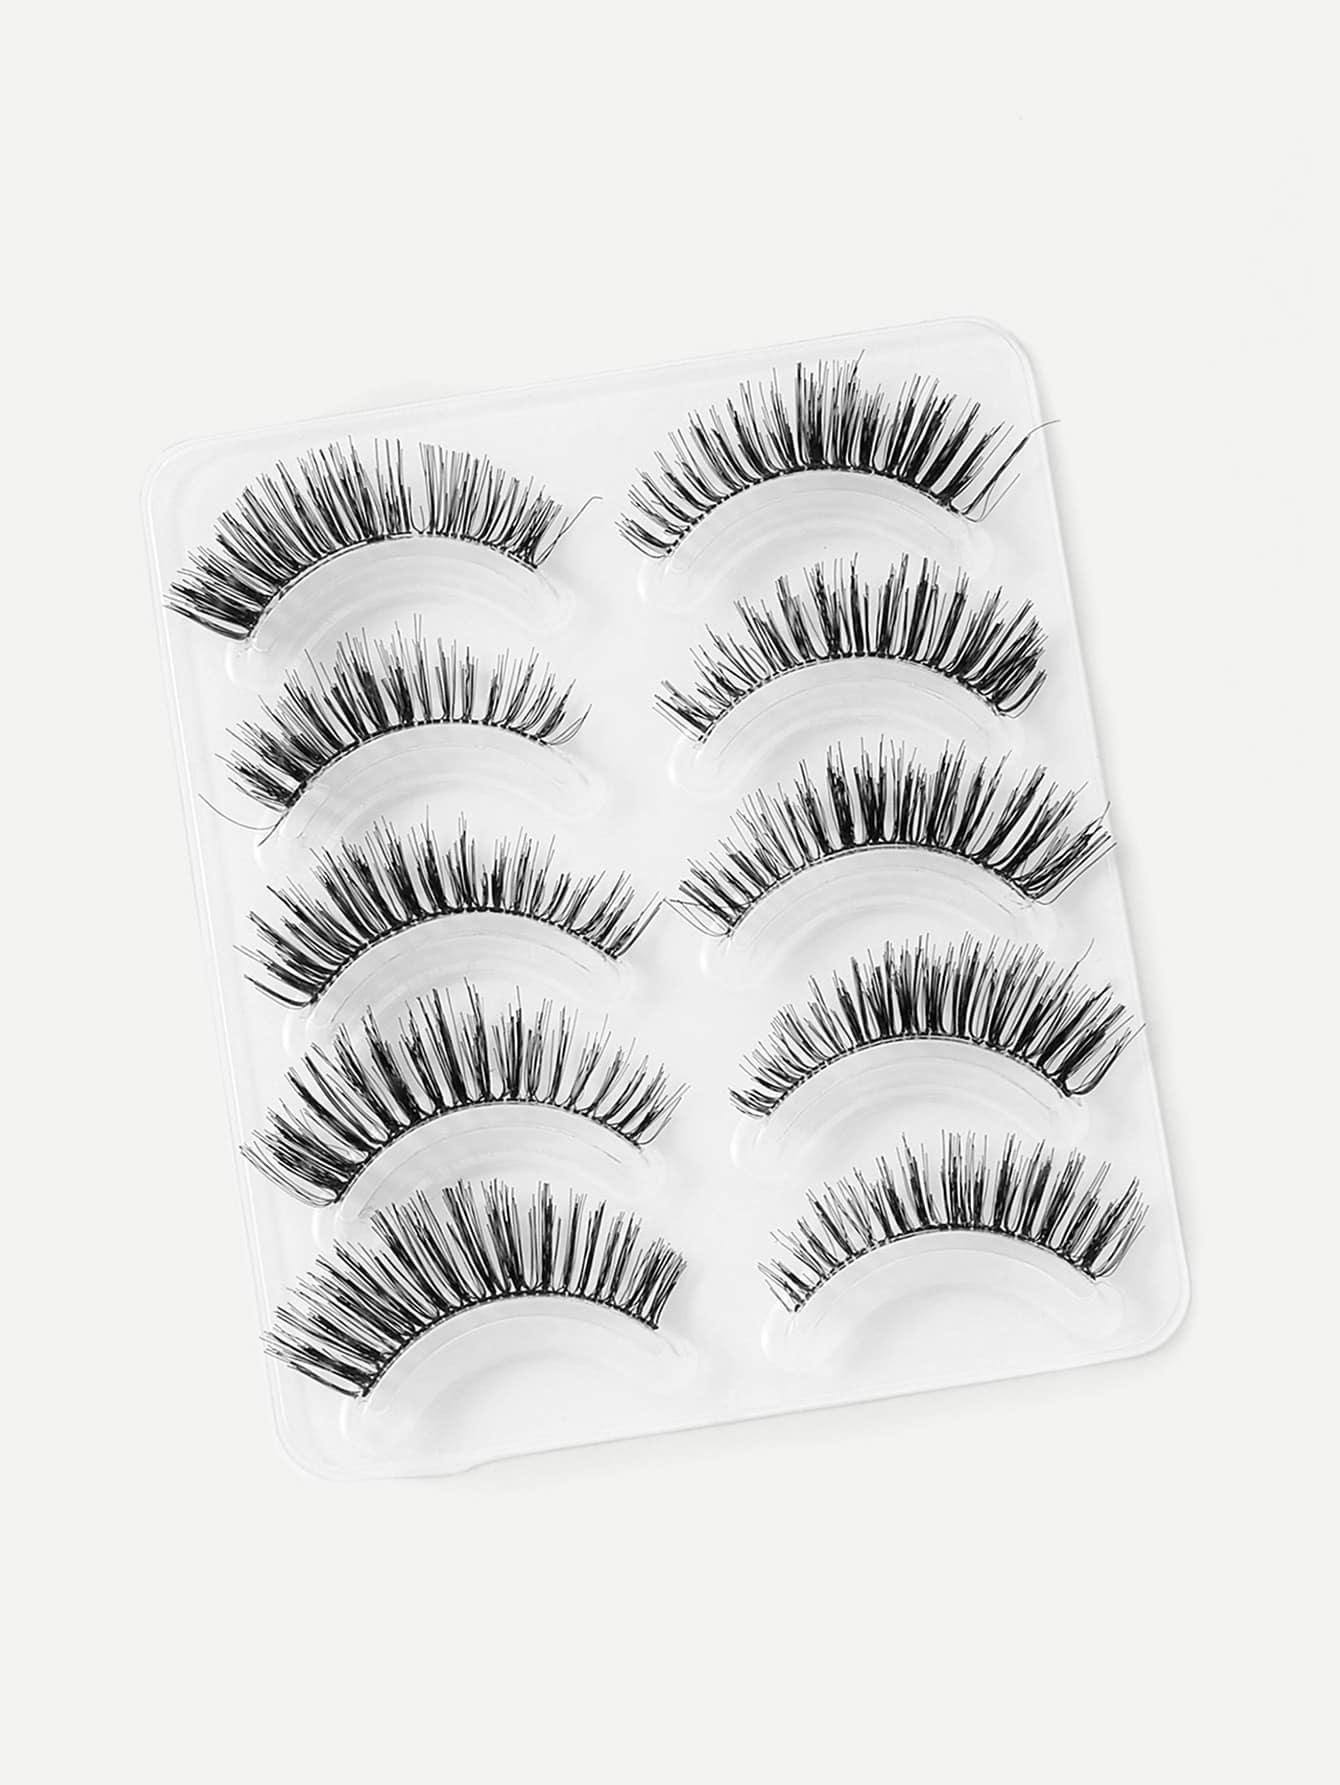 Natural False Eyelashes 5pairs женские чулки 1 5pairs